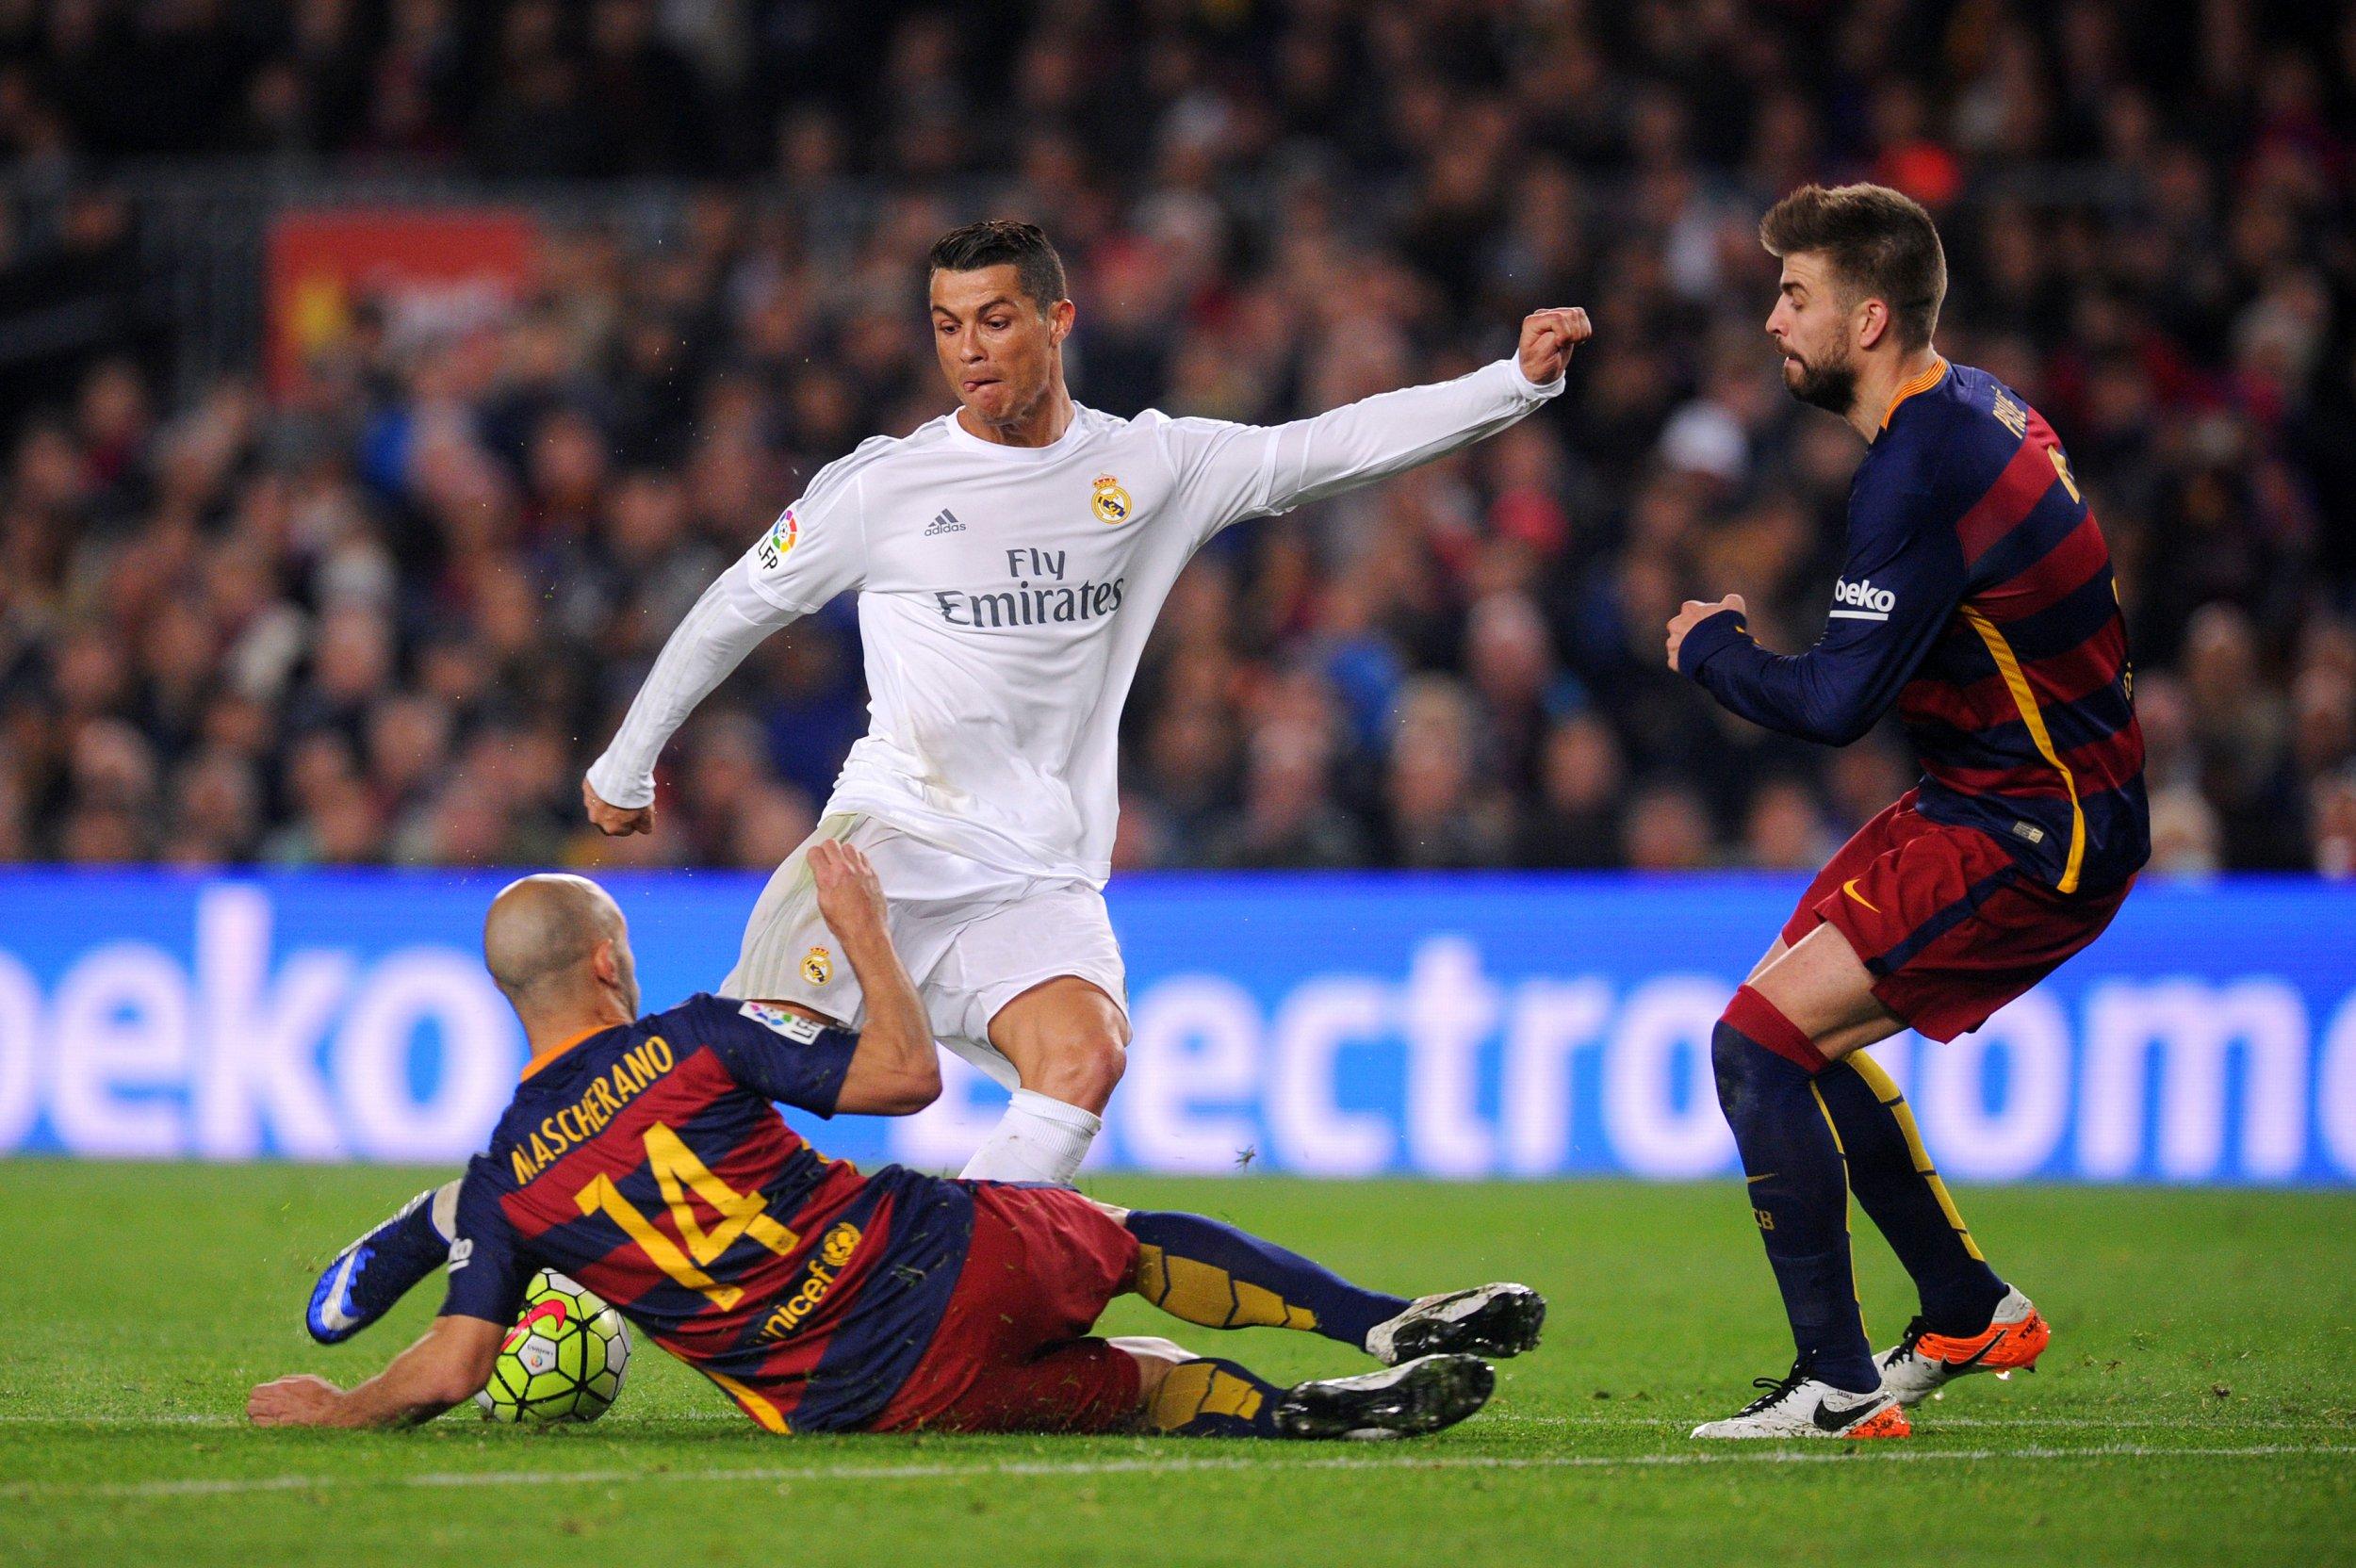 Cristiano Ronaldo scored the winning goal in El Clasico on Saturday.